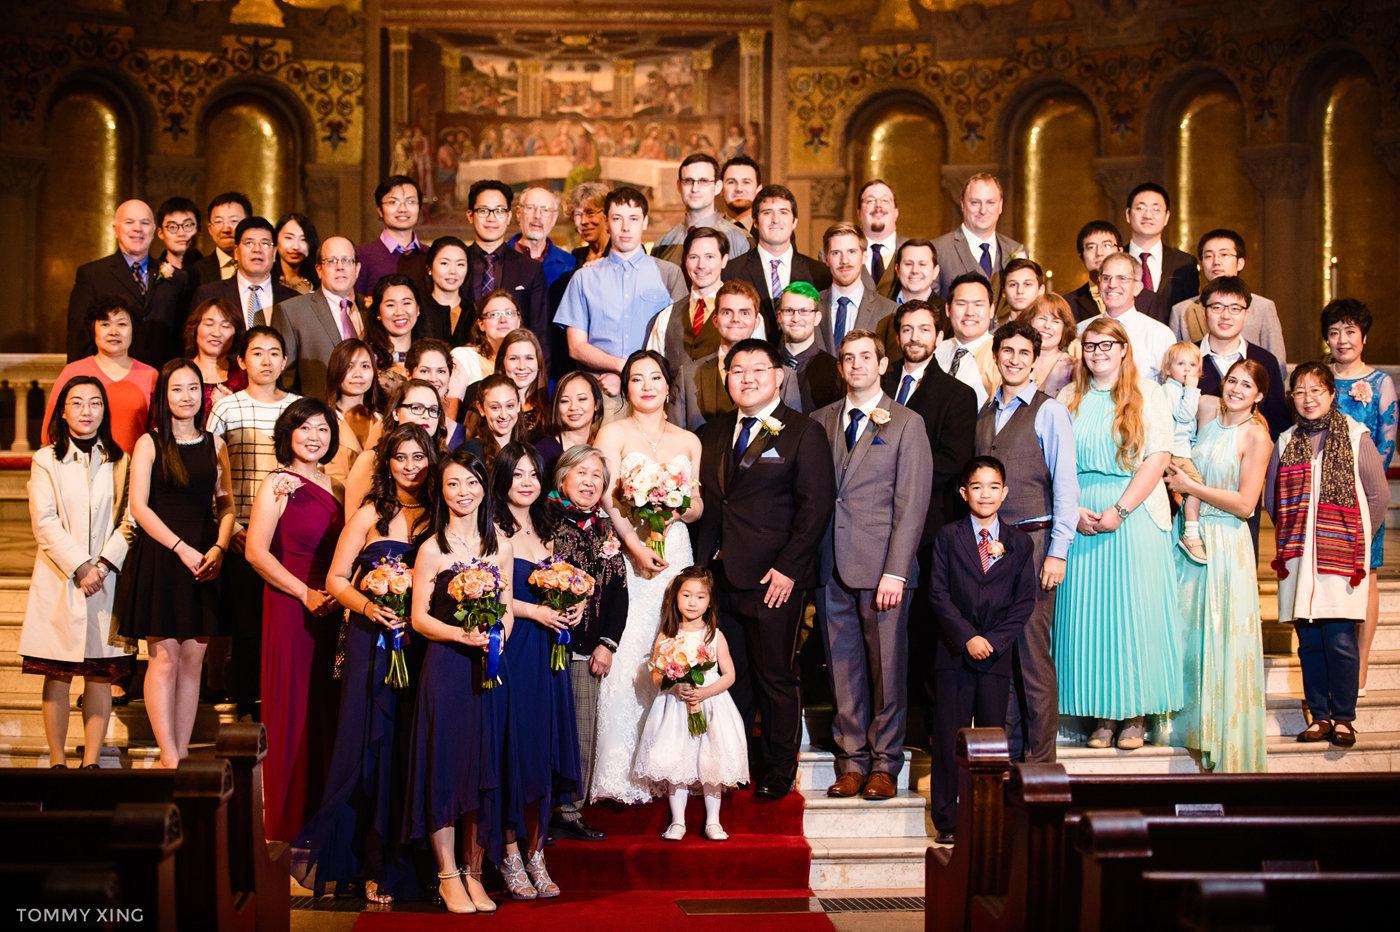 STANFORD MEMORIAL CHURCH WEDDING - Wenjie & Chengcheng - SAN FRANCISCO BAY AREA 斯坦福教堂婚礼跟拍 - 洛杉矶婚礼婚纱照摄影师 Tommy Xing Photography135.jpg